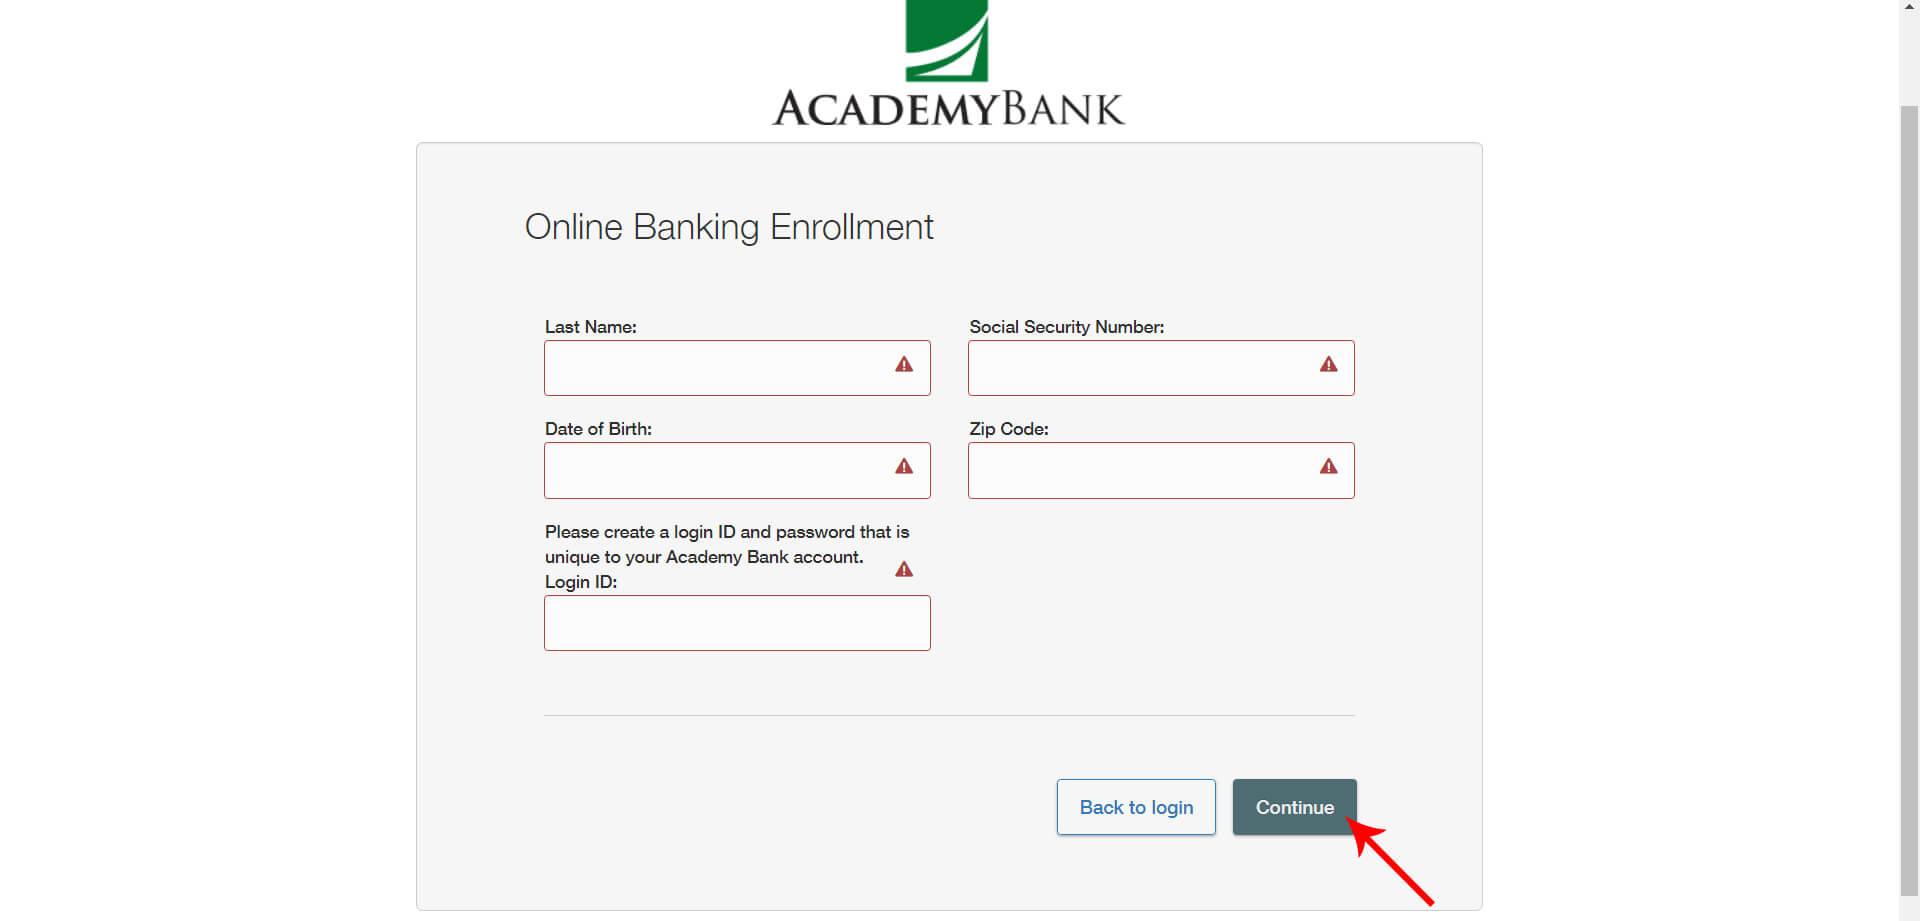 Academybank Online Banking Enrollment Form